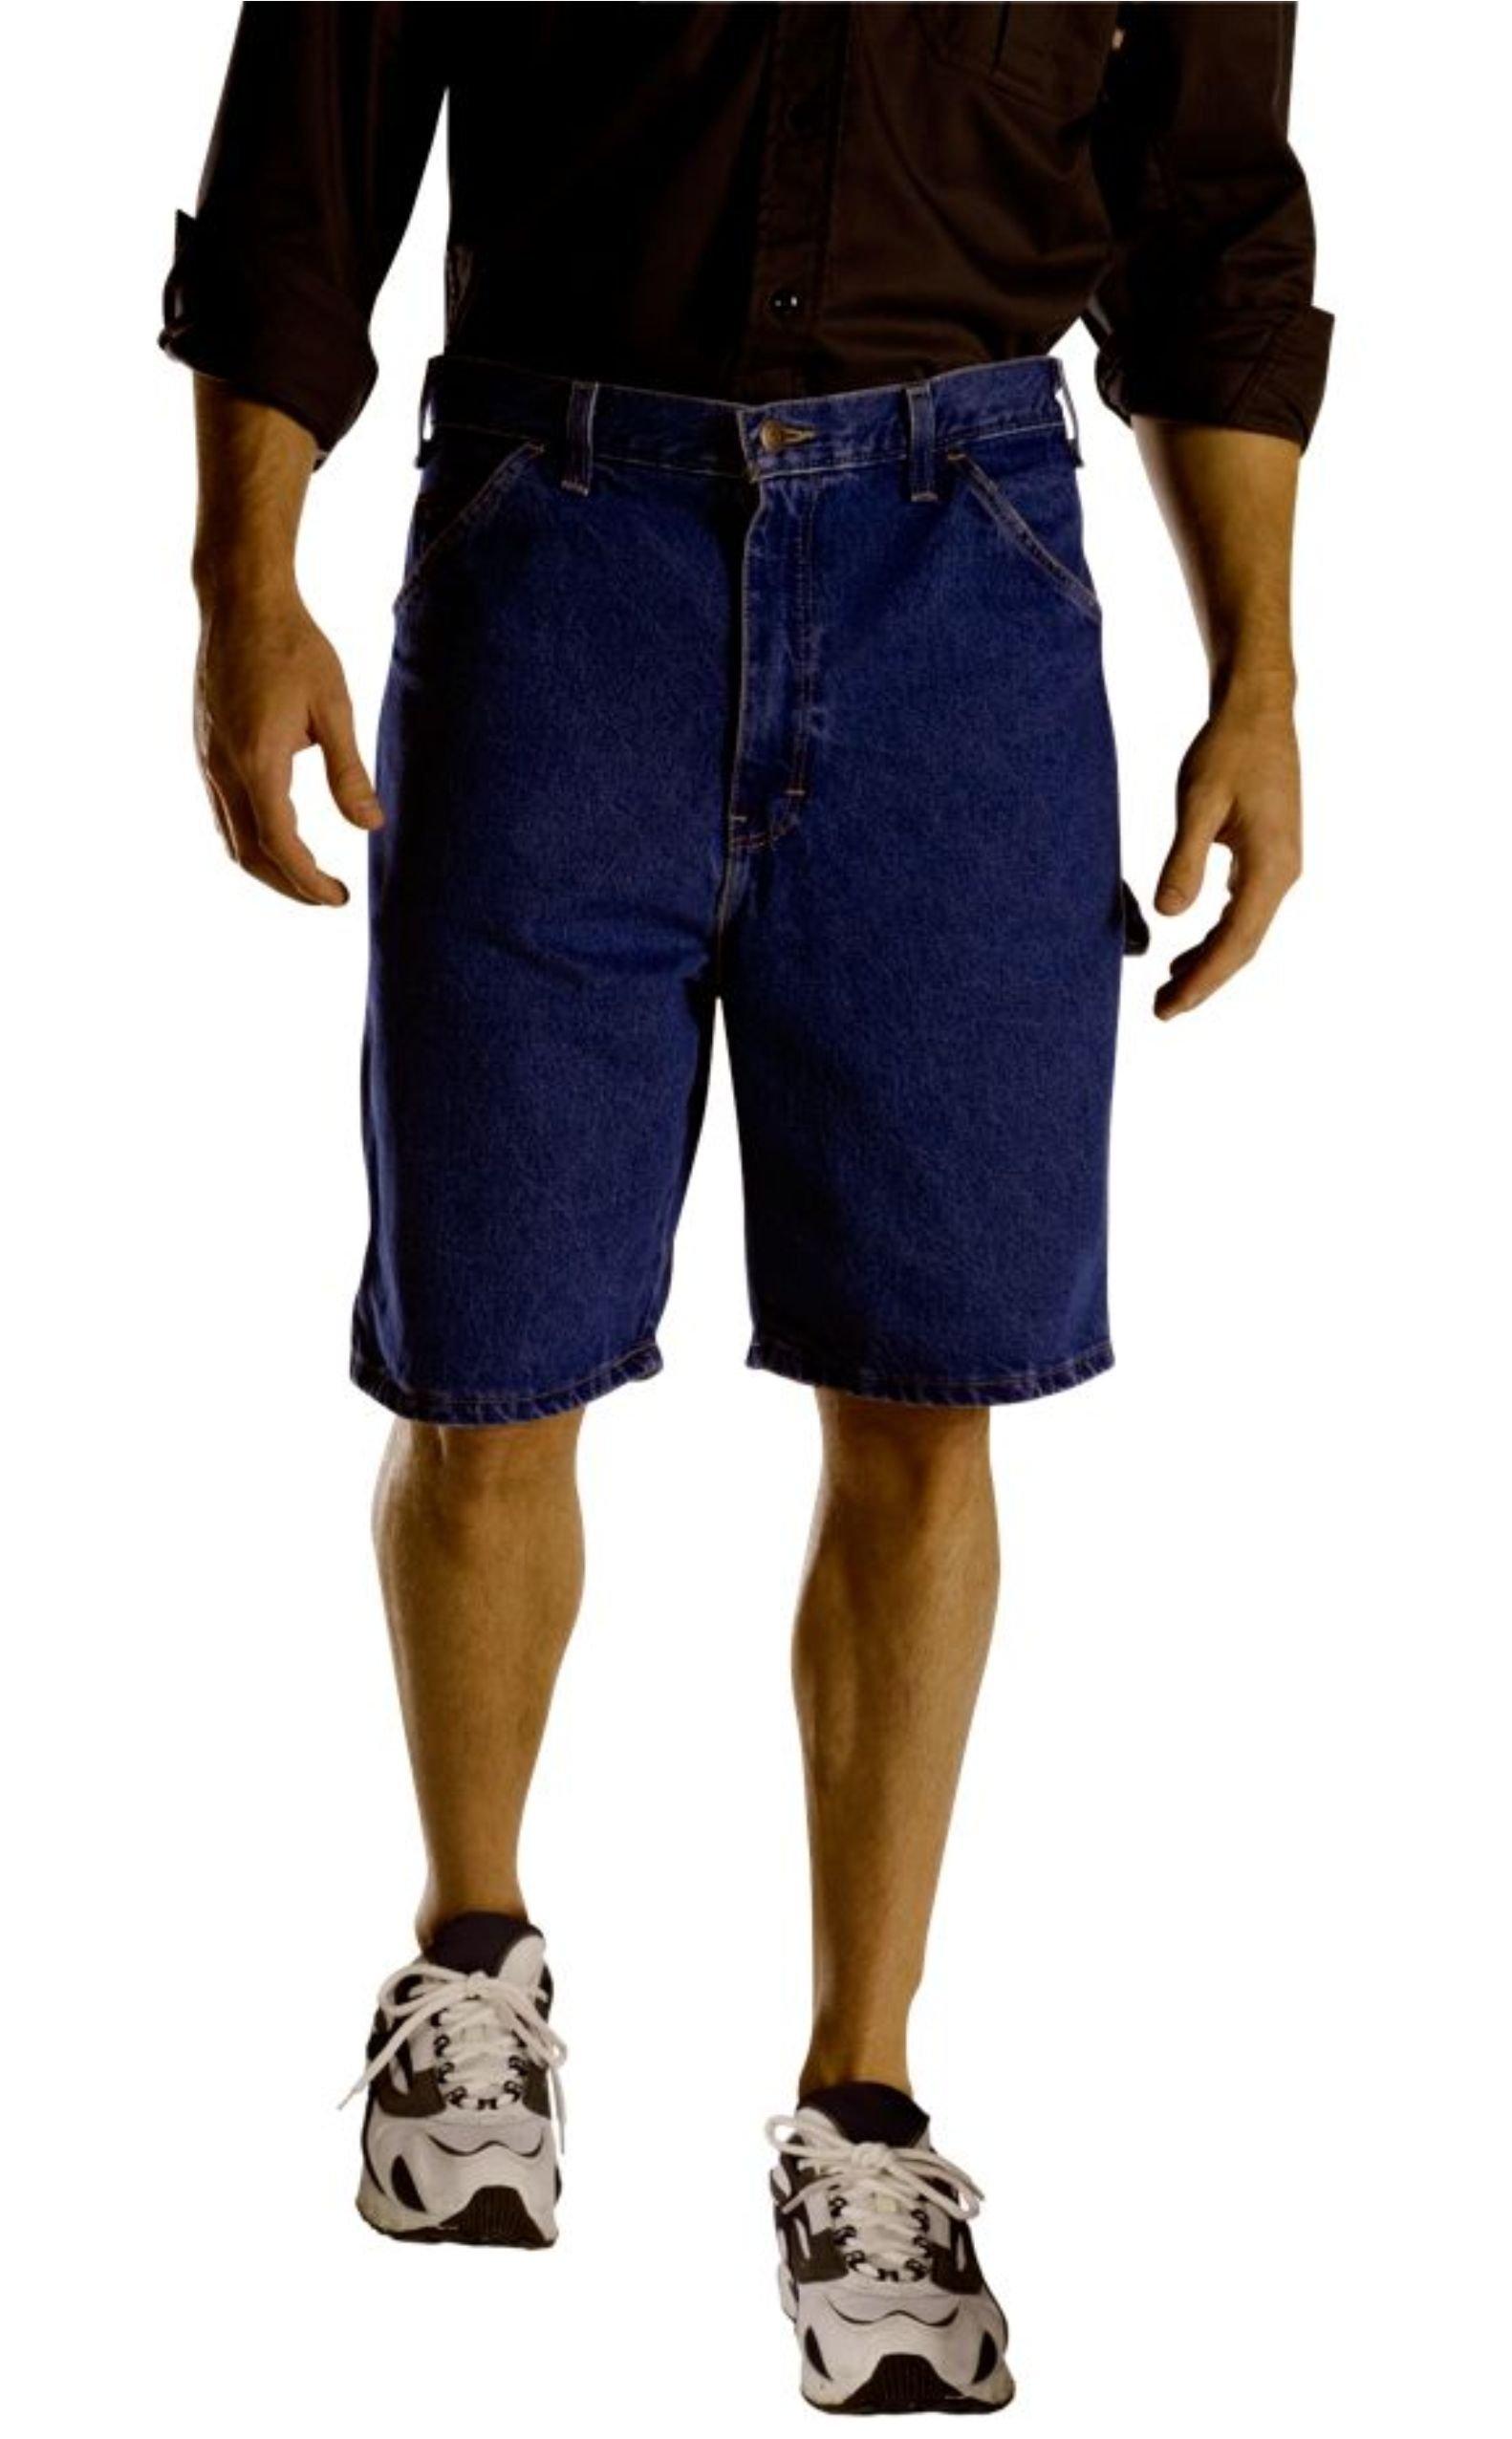 Dickies Men's 9 1/2 Inch Lightweight Denim Carpenter Short, Indigo Blue, 34